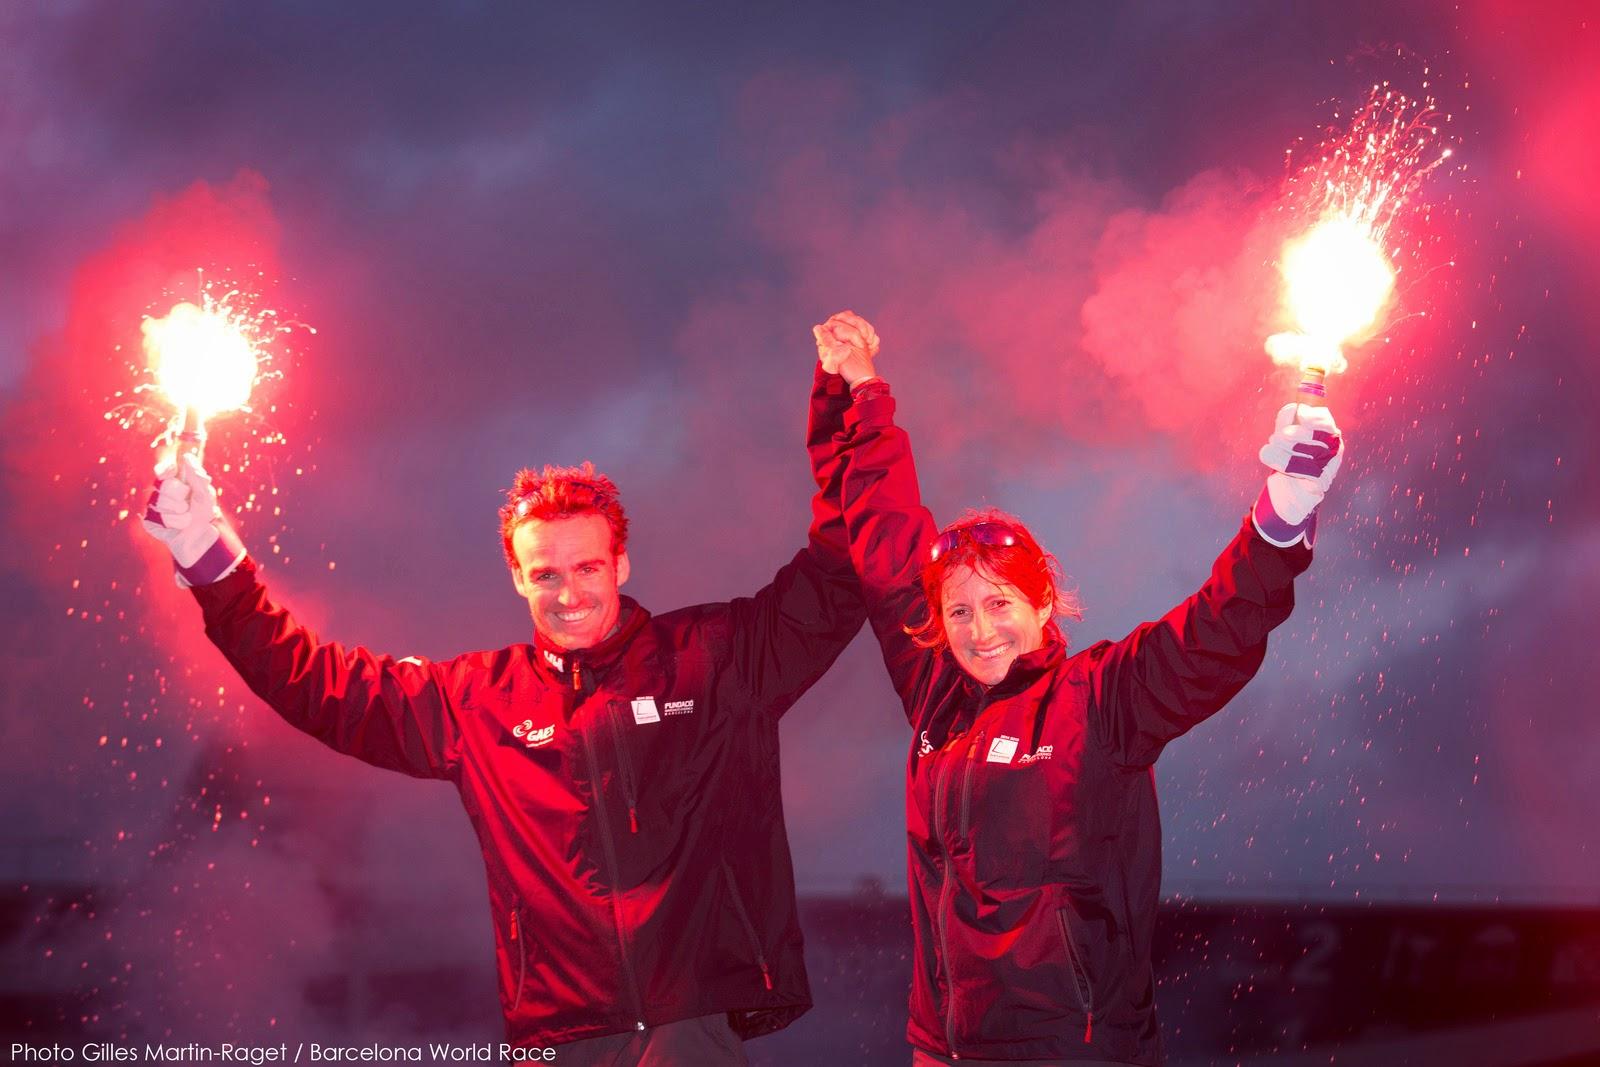 Anna Corbella et Gerard Marin troisièmes de la Barcelona World Race.